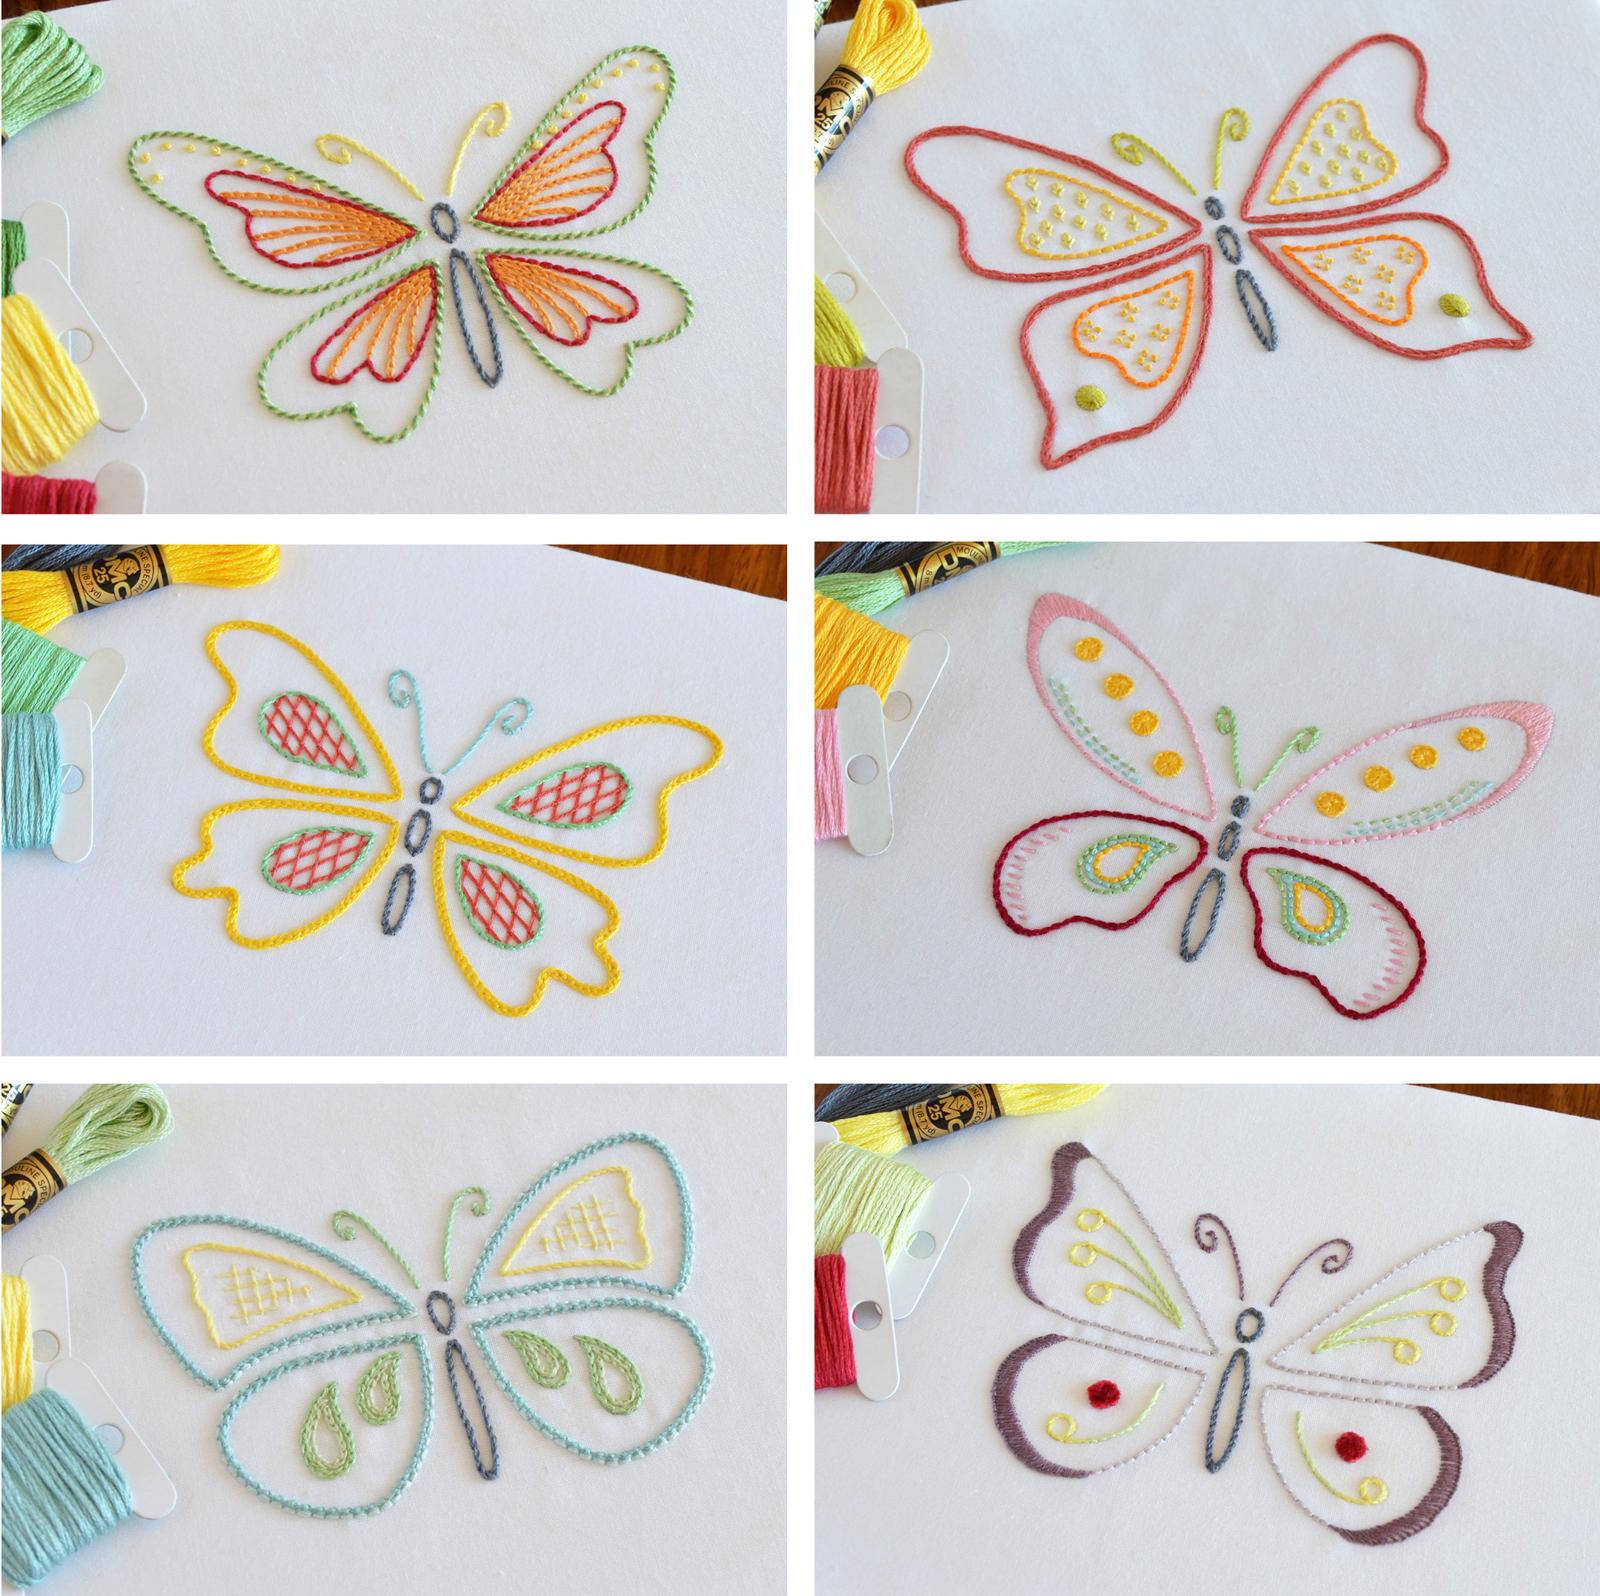 Papillon2_KellyFletcher.jpg